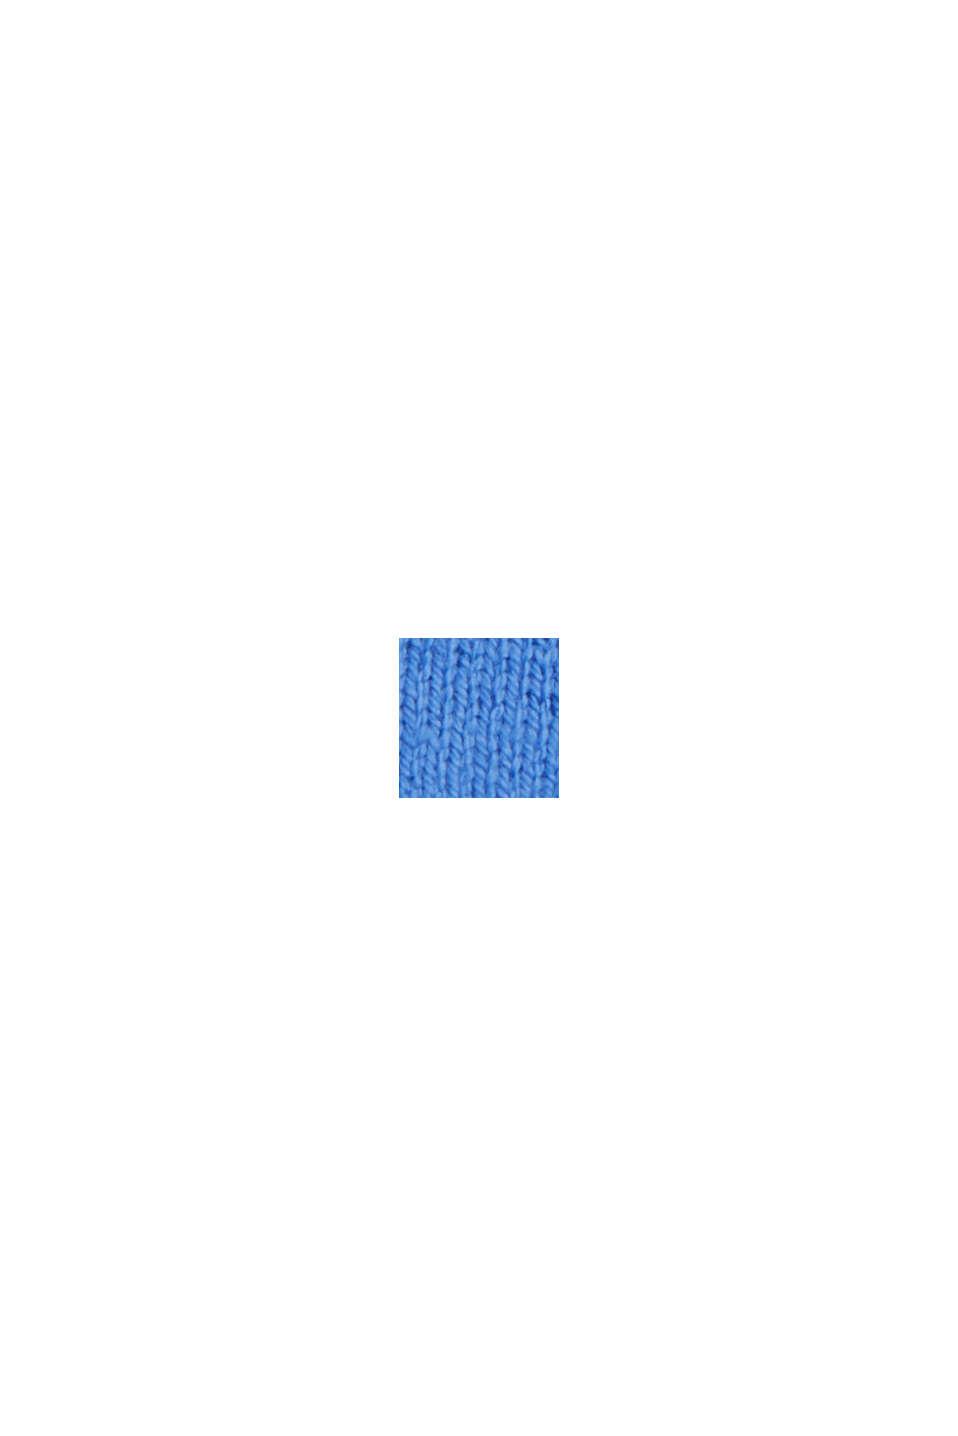 Basiscardigan med rund hals, økologisk bomuldsblanding, BRIGHT BLUE, swatch